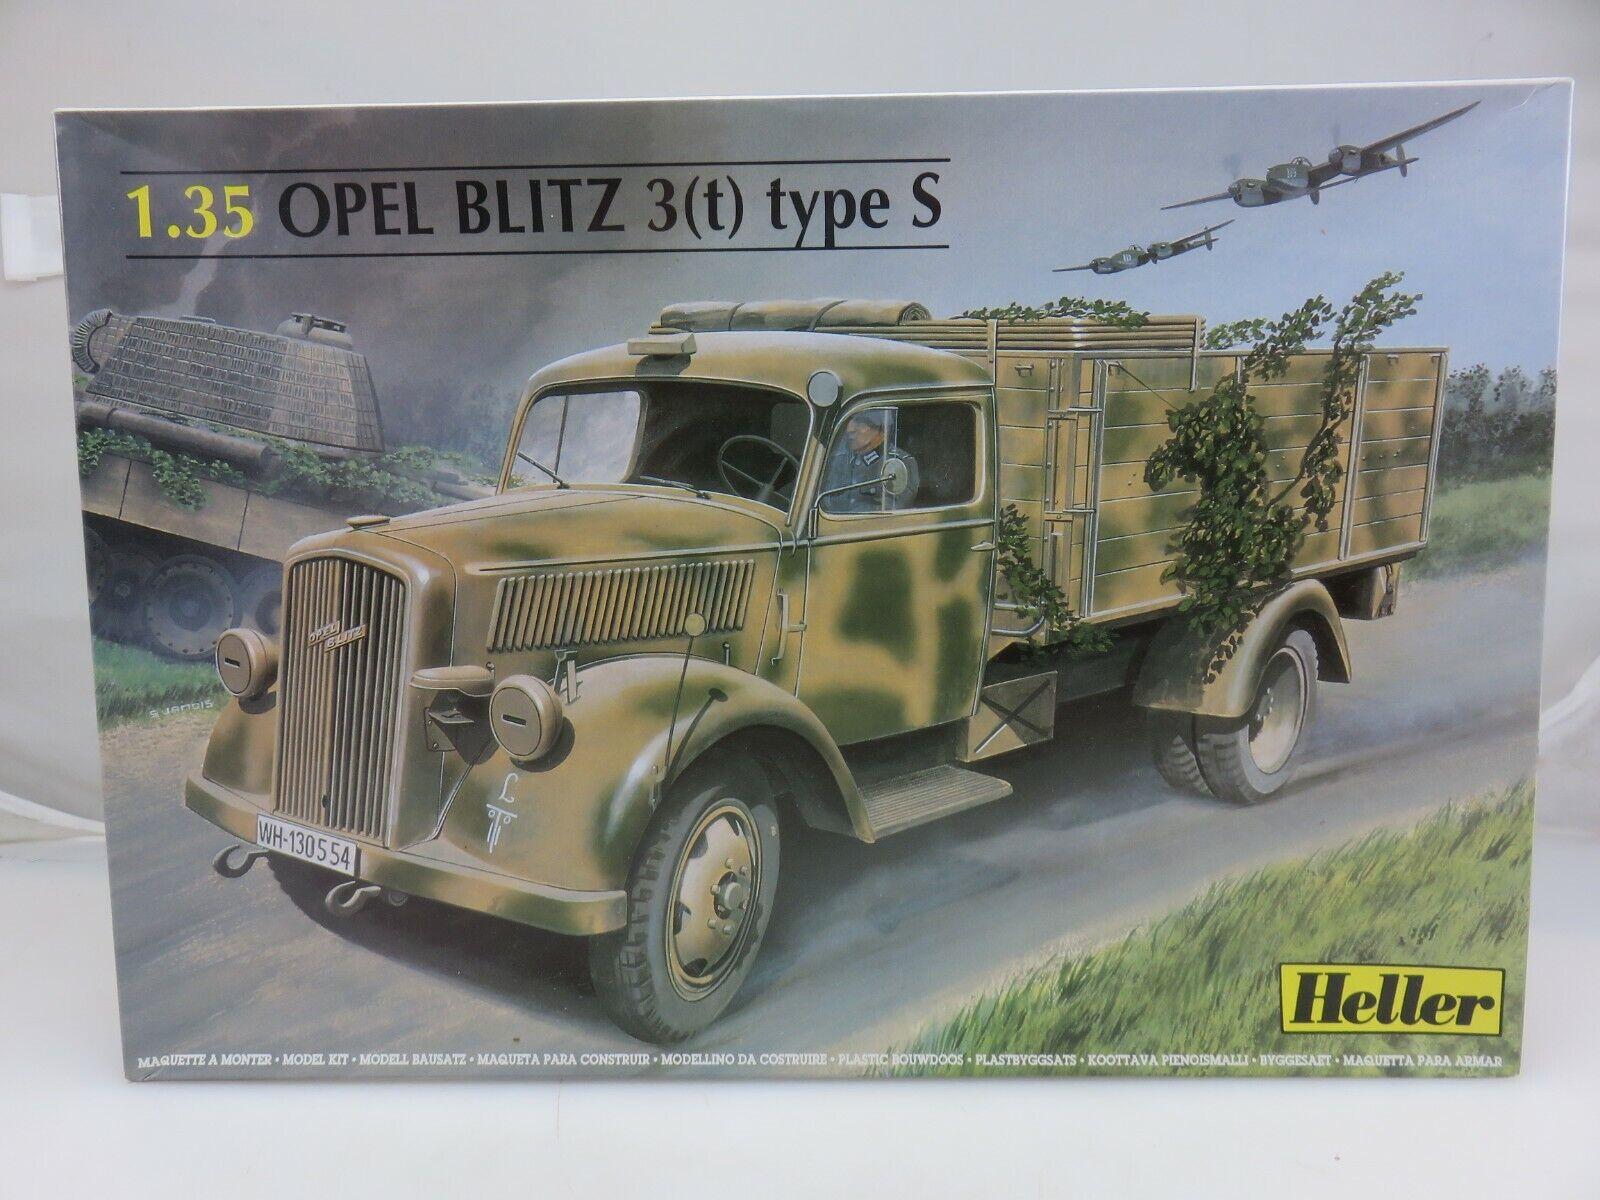 Heller OPEL BLITZ 3(t) Type S 1 35 Scale Plastic Model Kit 81128 UNBUILT